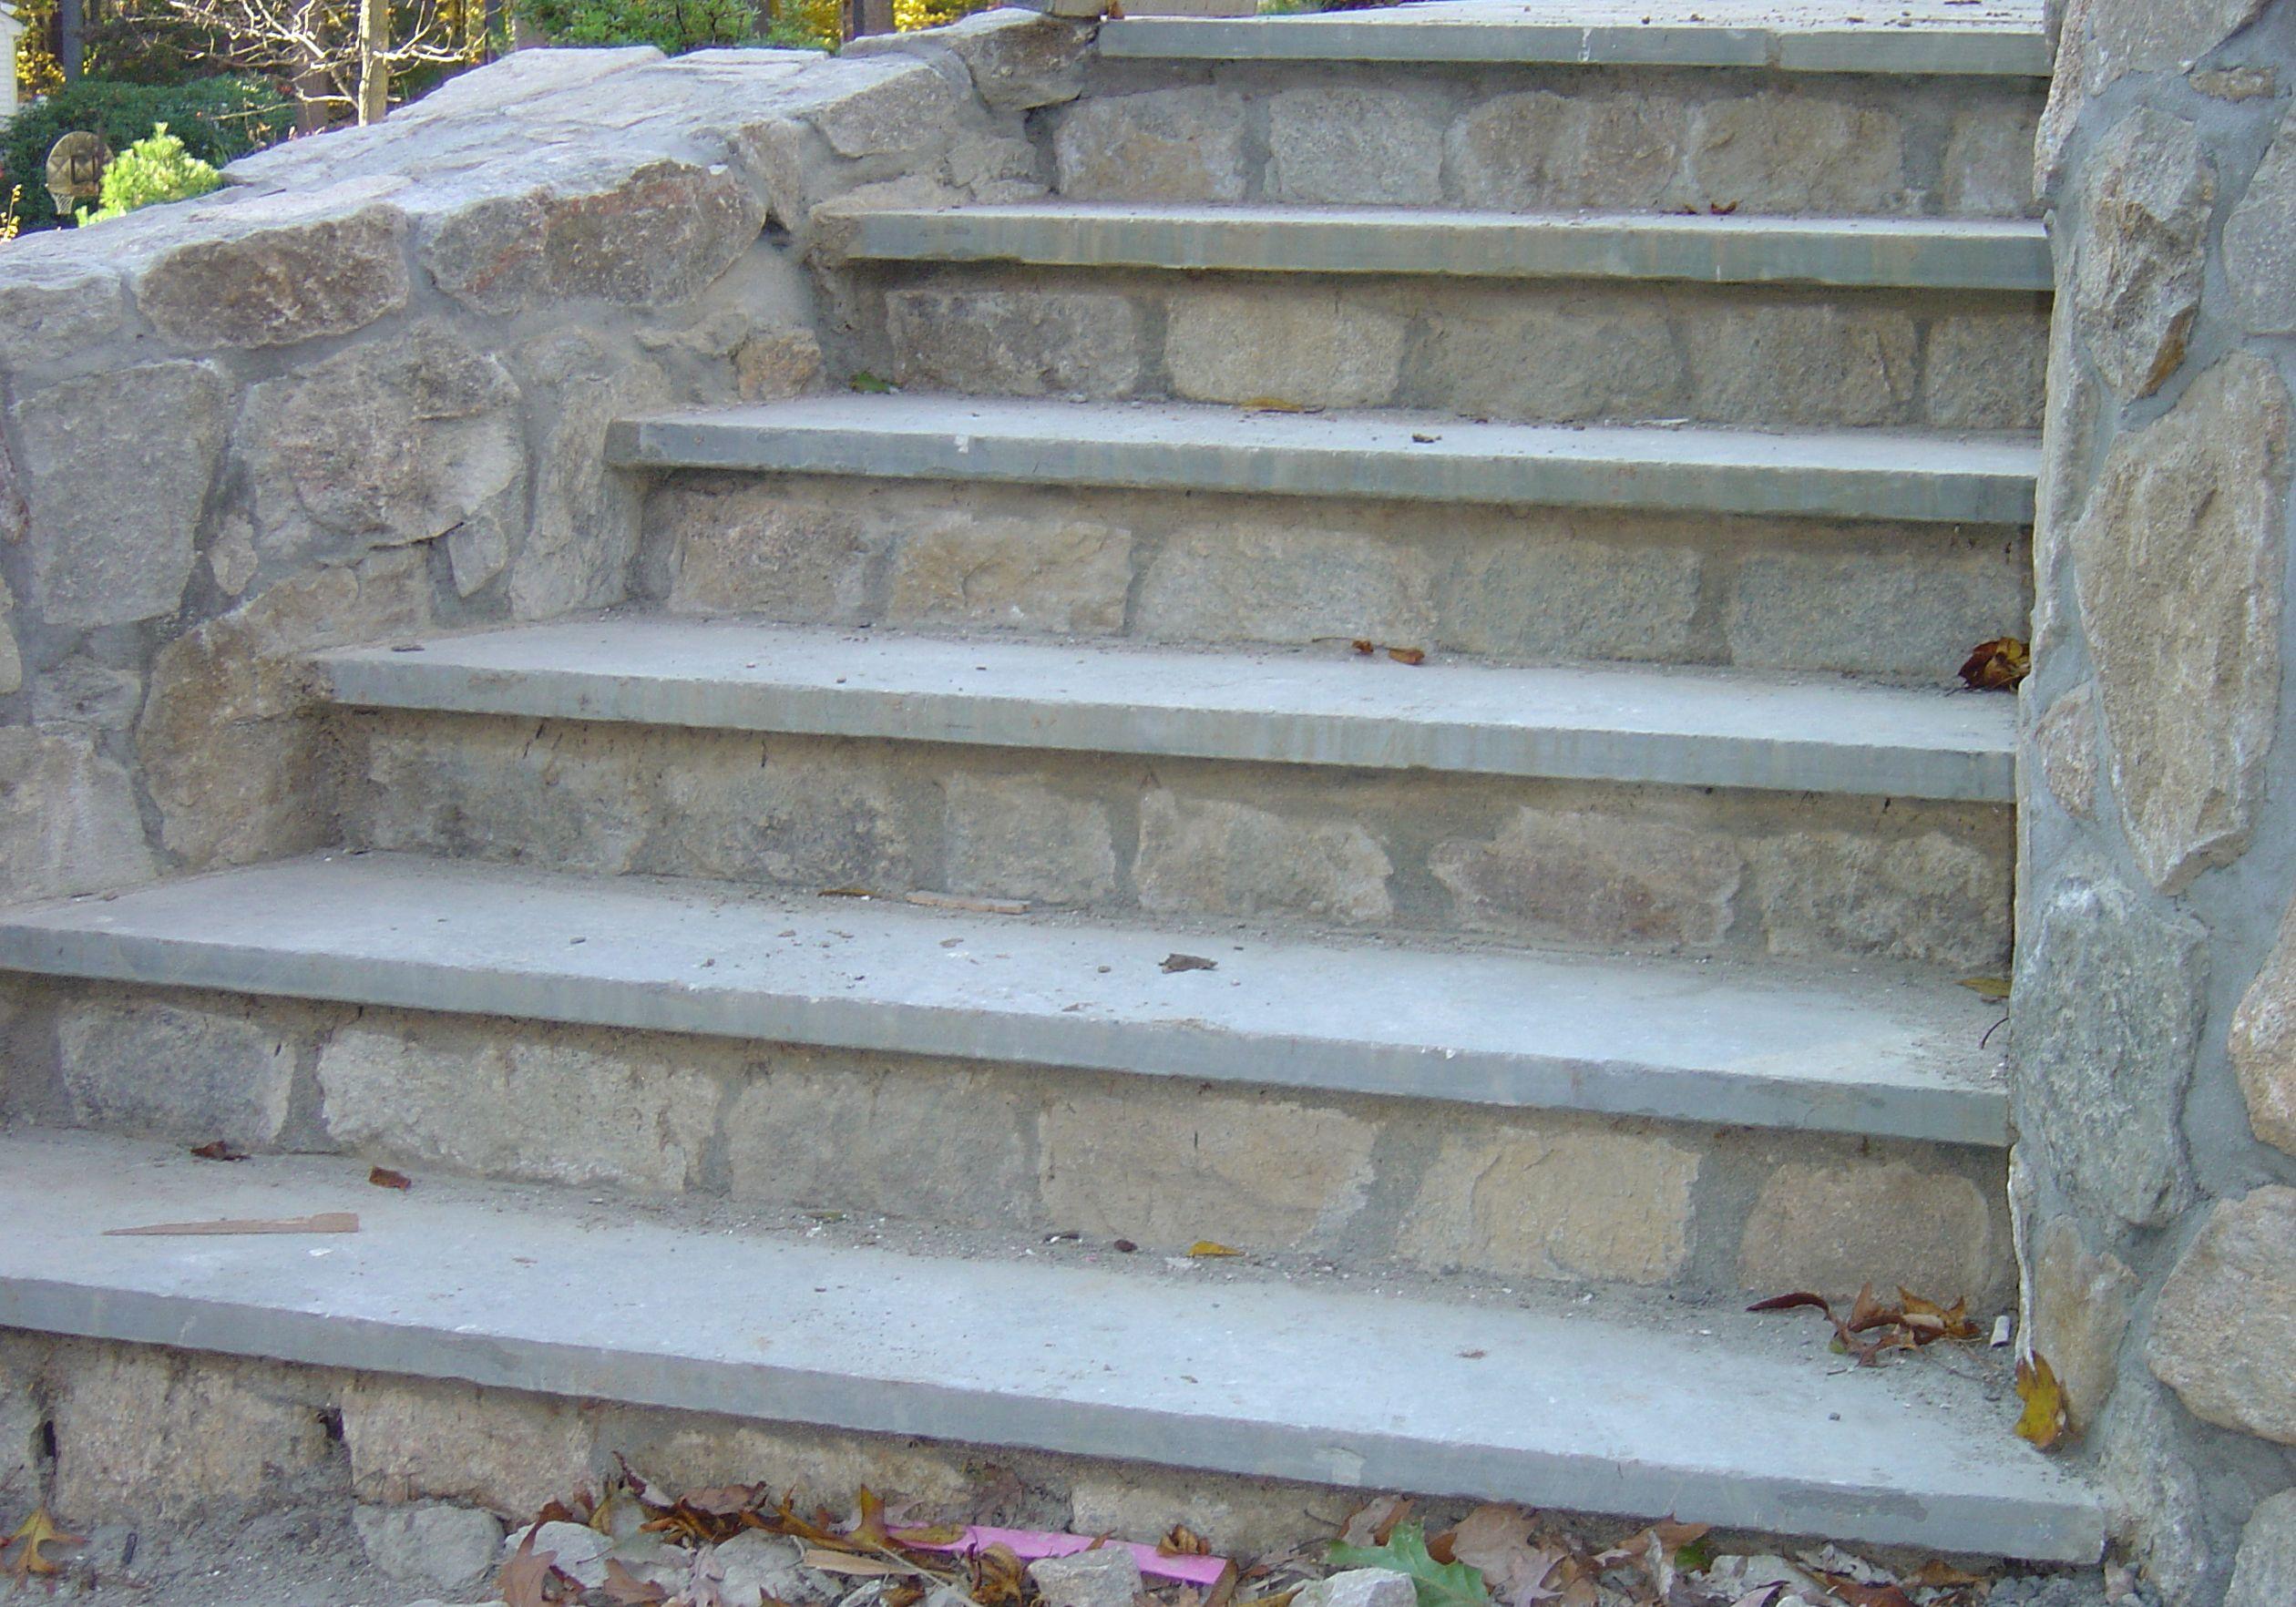 Chimney Cricket Stone Porch Steps Stone Pavers Brick